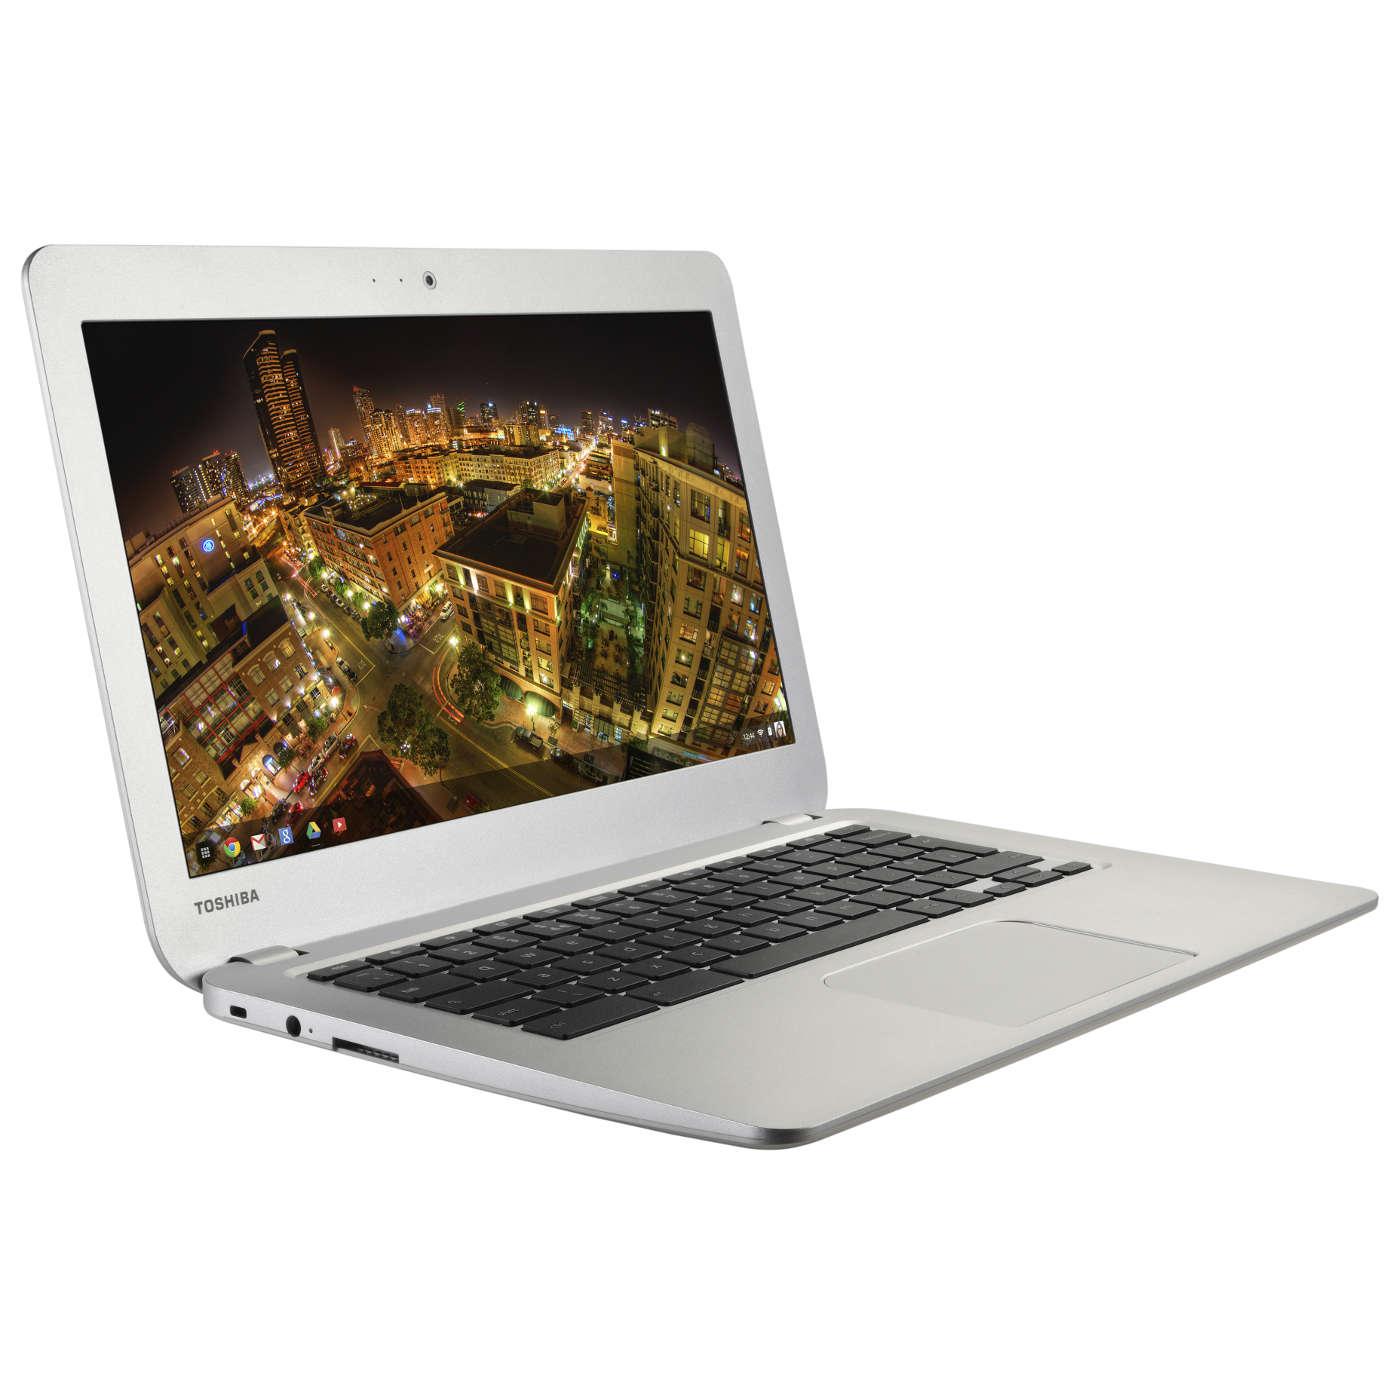 "PC portable Toshiba Chromebook CB30-102 Intel Celeron 2955U 2 Go SSD 16 Go 13.3"" LED HD Wi-Fi N/Bluetooth Webcam Google Chrome OS"